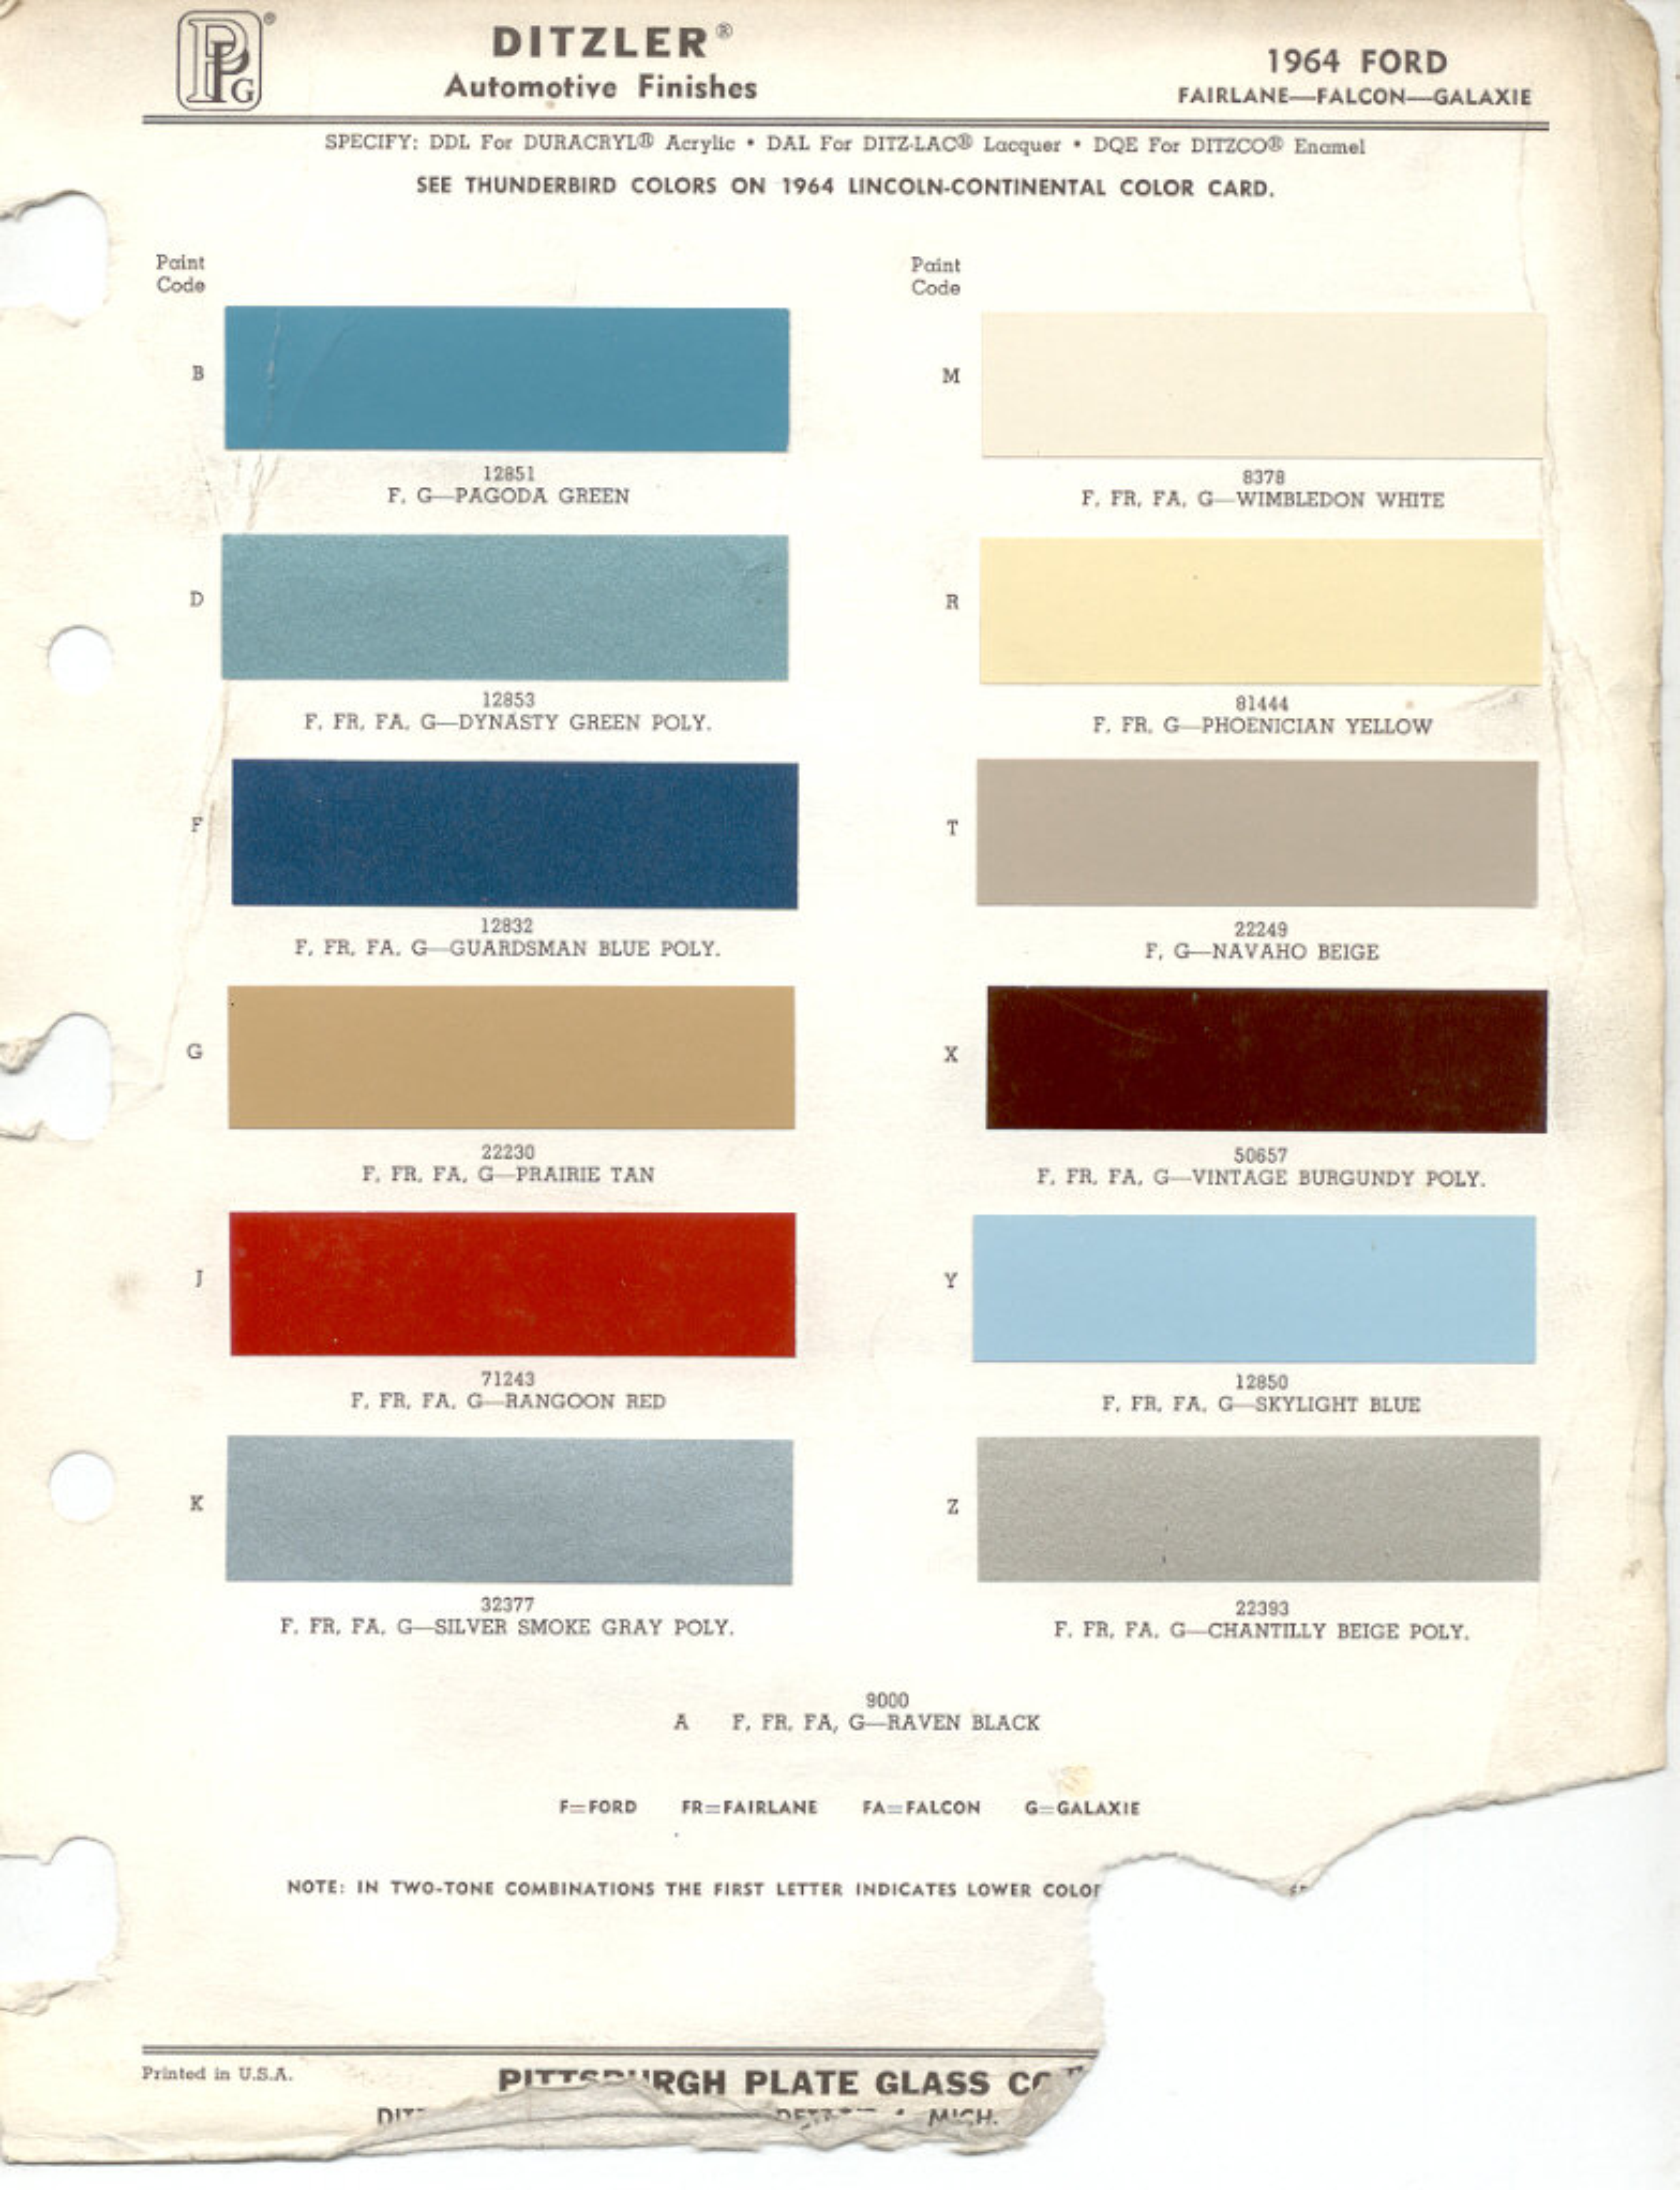 1964 ford paint chips. Black Bedroom Furniture Sets. Home Design Ideas